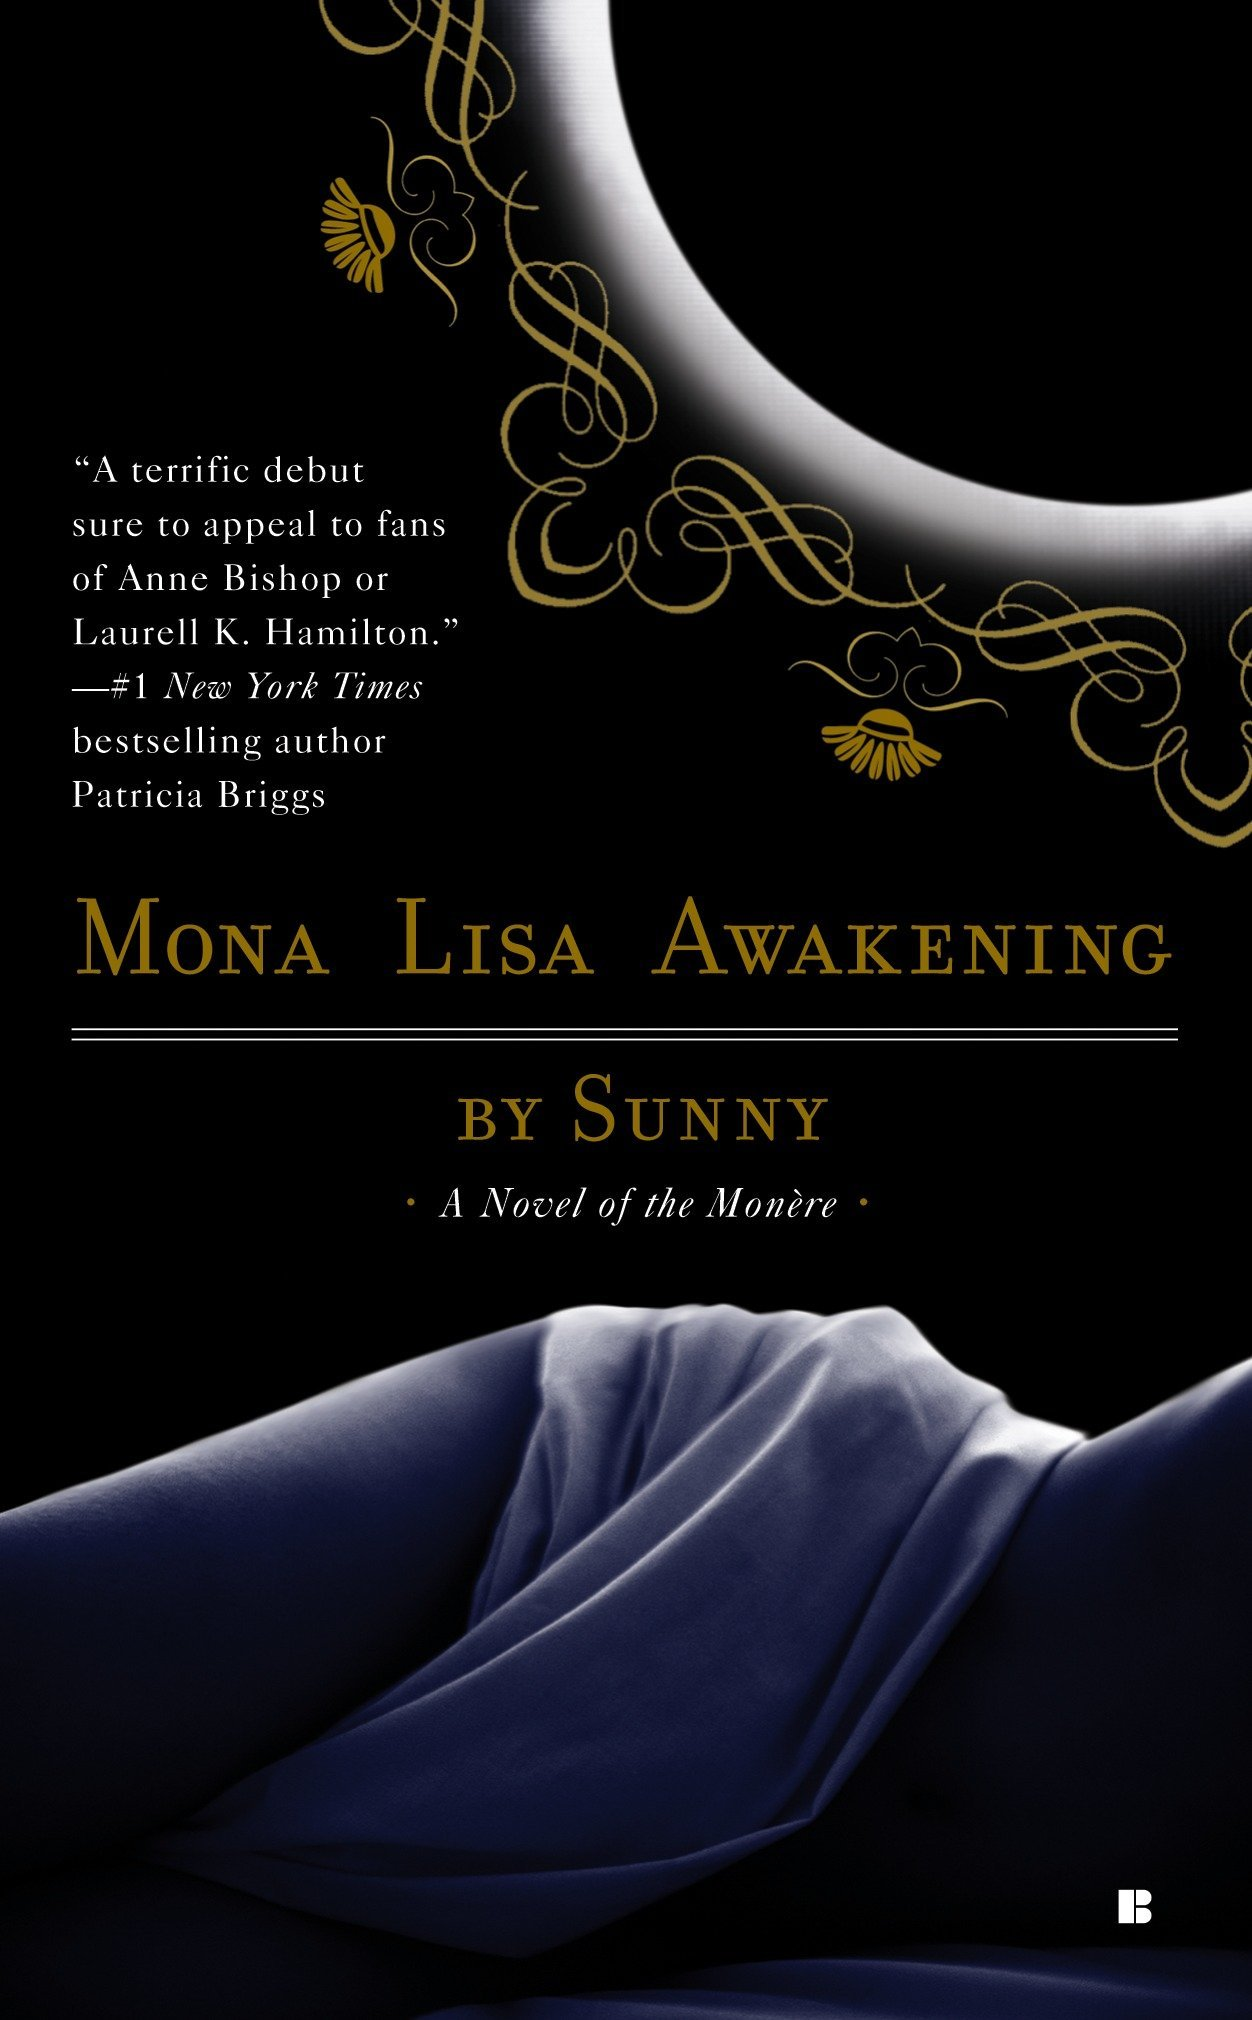 Mona Lisa Awakening Book Cover